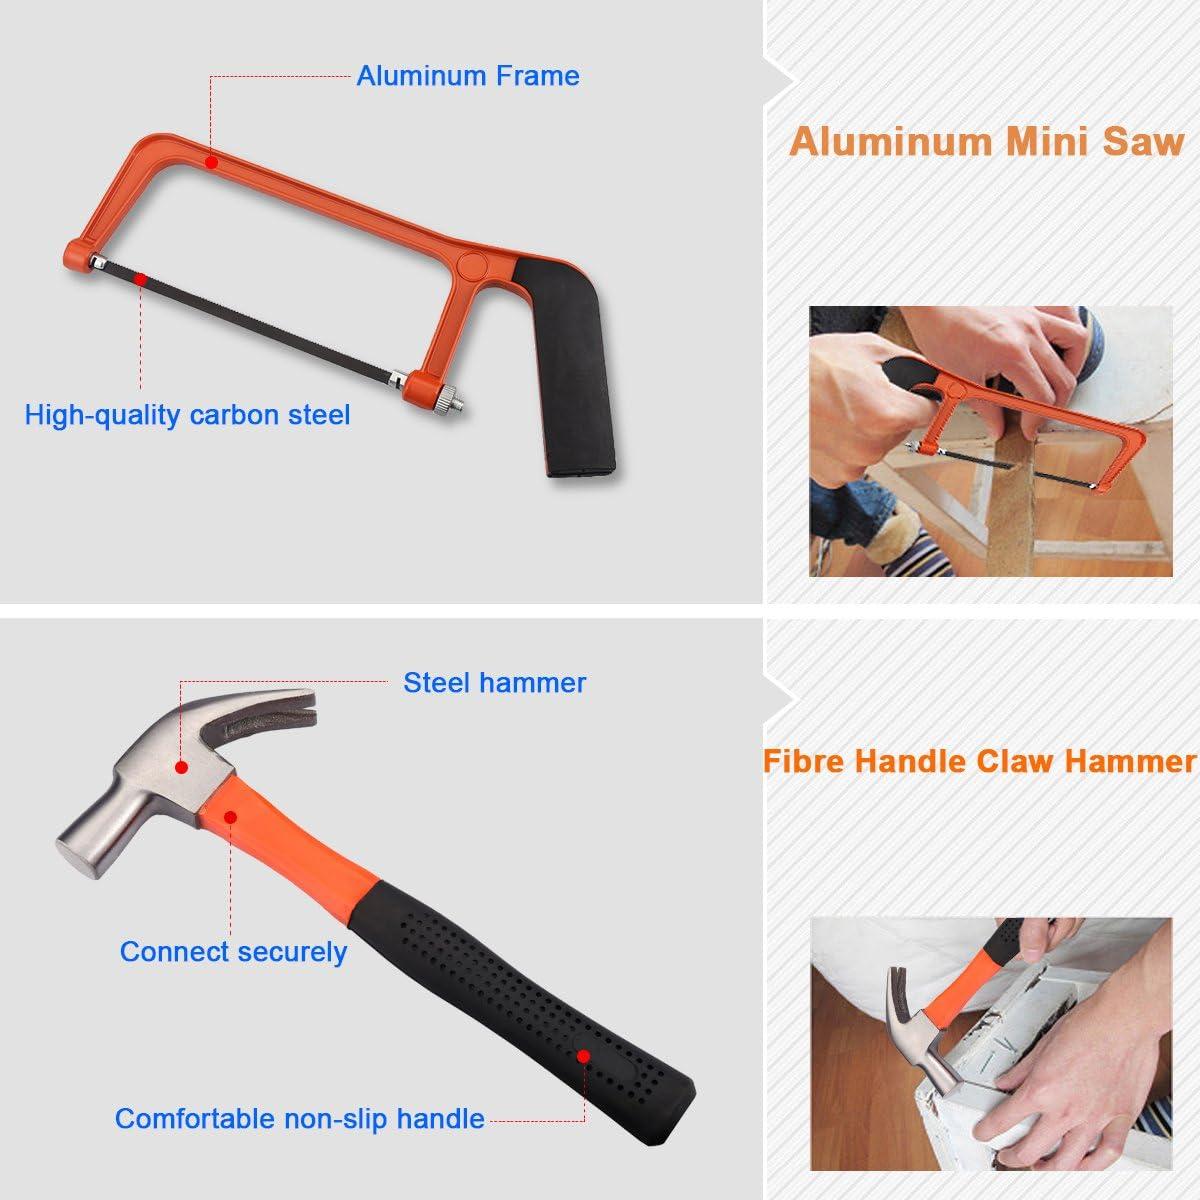 Clamp Hammer Tester Pen for Garden Garage Bike Car Maintenance Repairing Spanner,Saw FLOUREON DIY Tool Kit 100 Pcs Hand Tool Set Household Basic Tool Kit with Screwdrivers